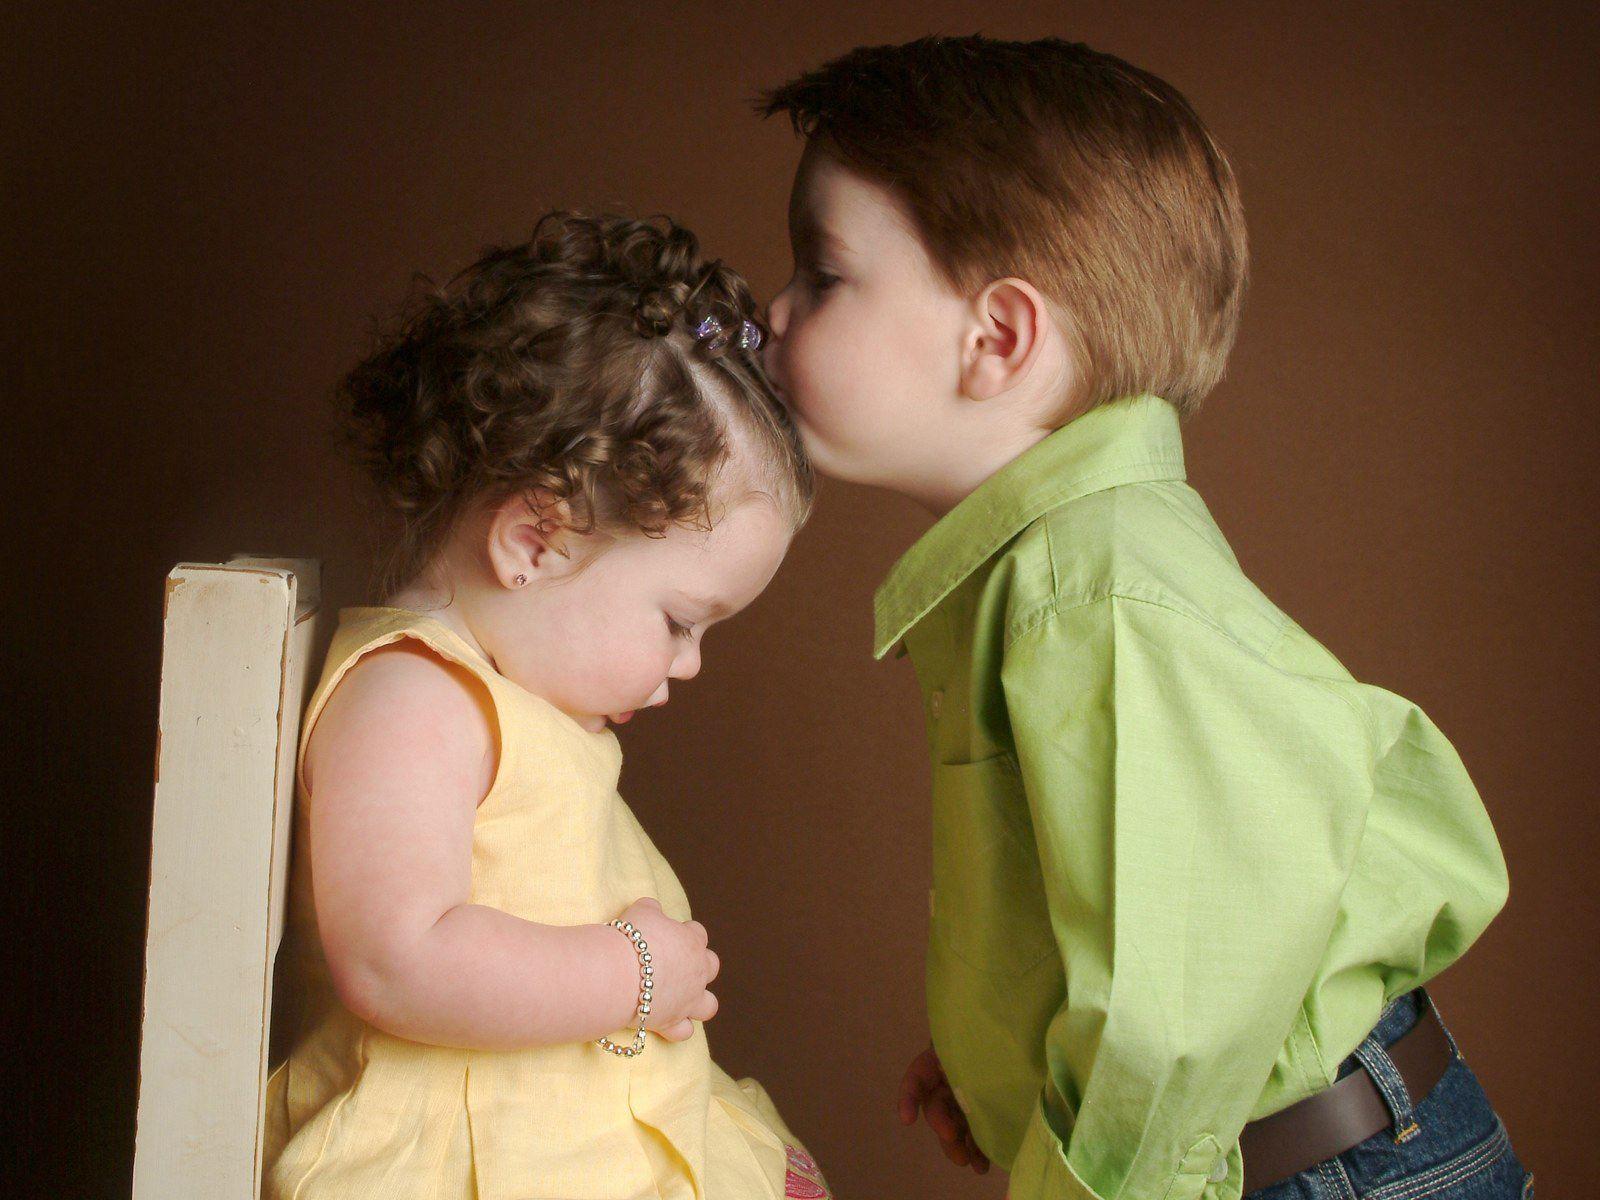 Take This Kiss Upon The Brow Cute Baby Couple Kids Kiss Cute Kiss